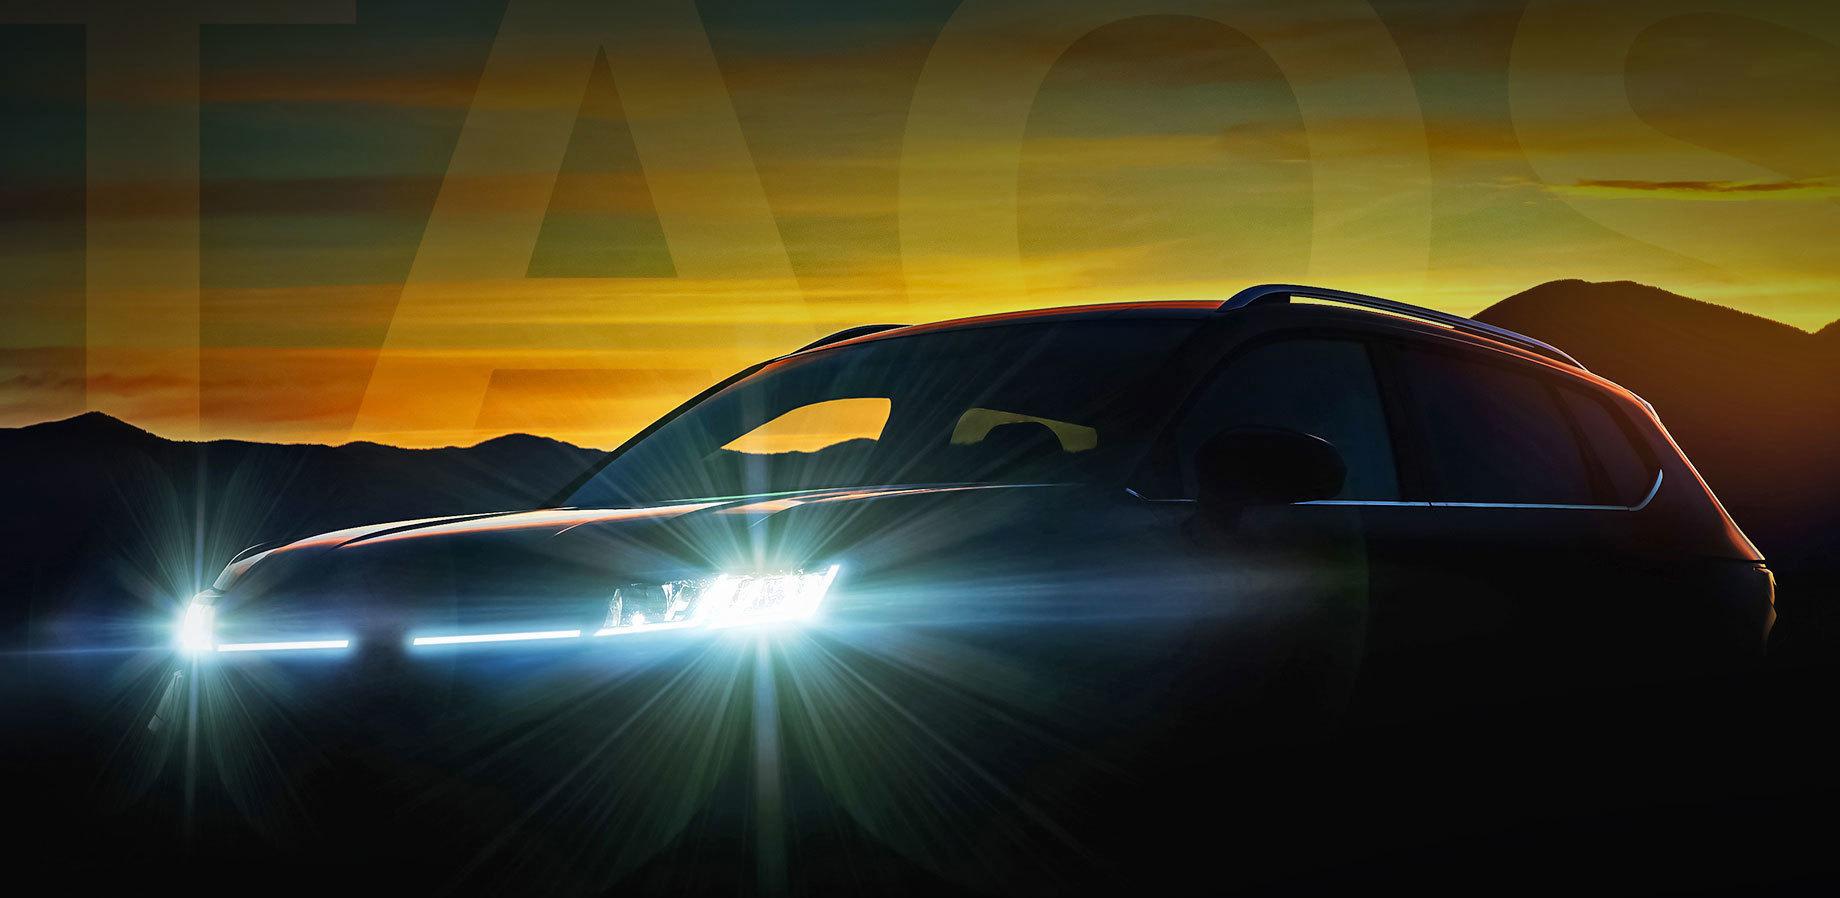 Дополнено: Volkswagen Taos получит 160 сил оттурбомотора 1.5